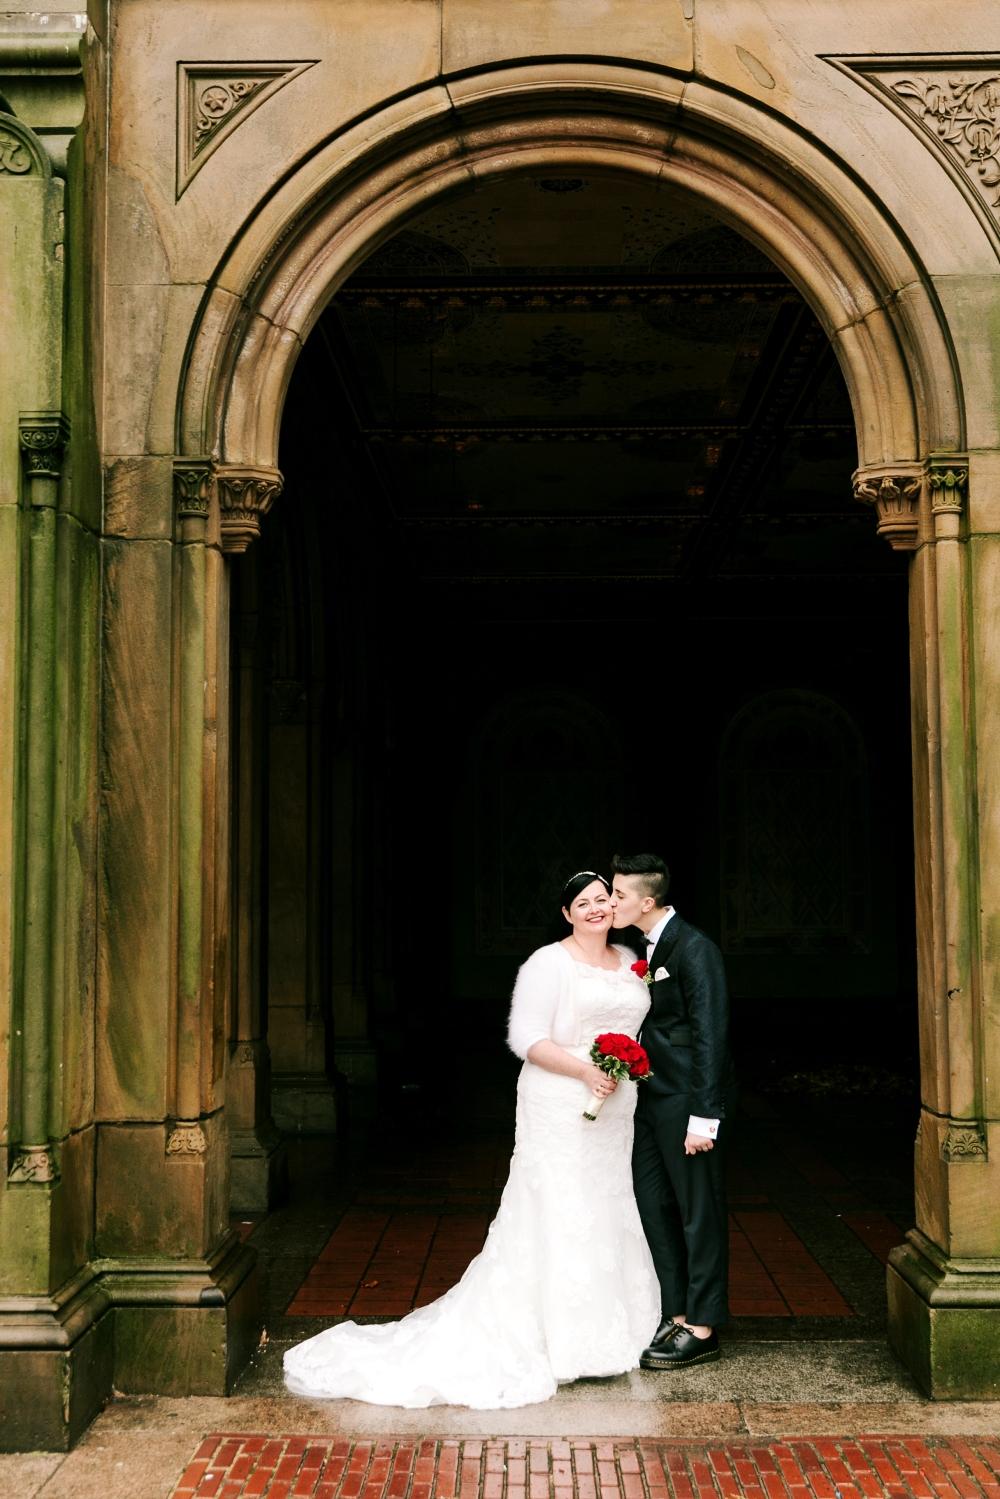 Bethesda_fountain_centralpark_wedding_RJ-301